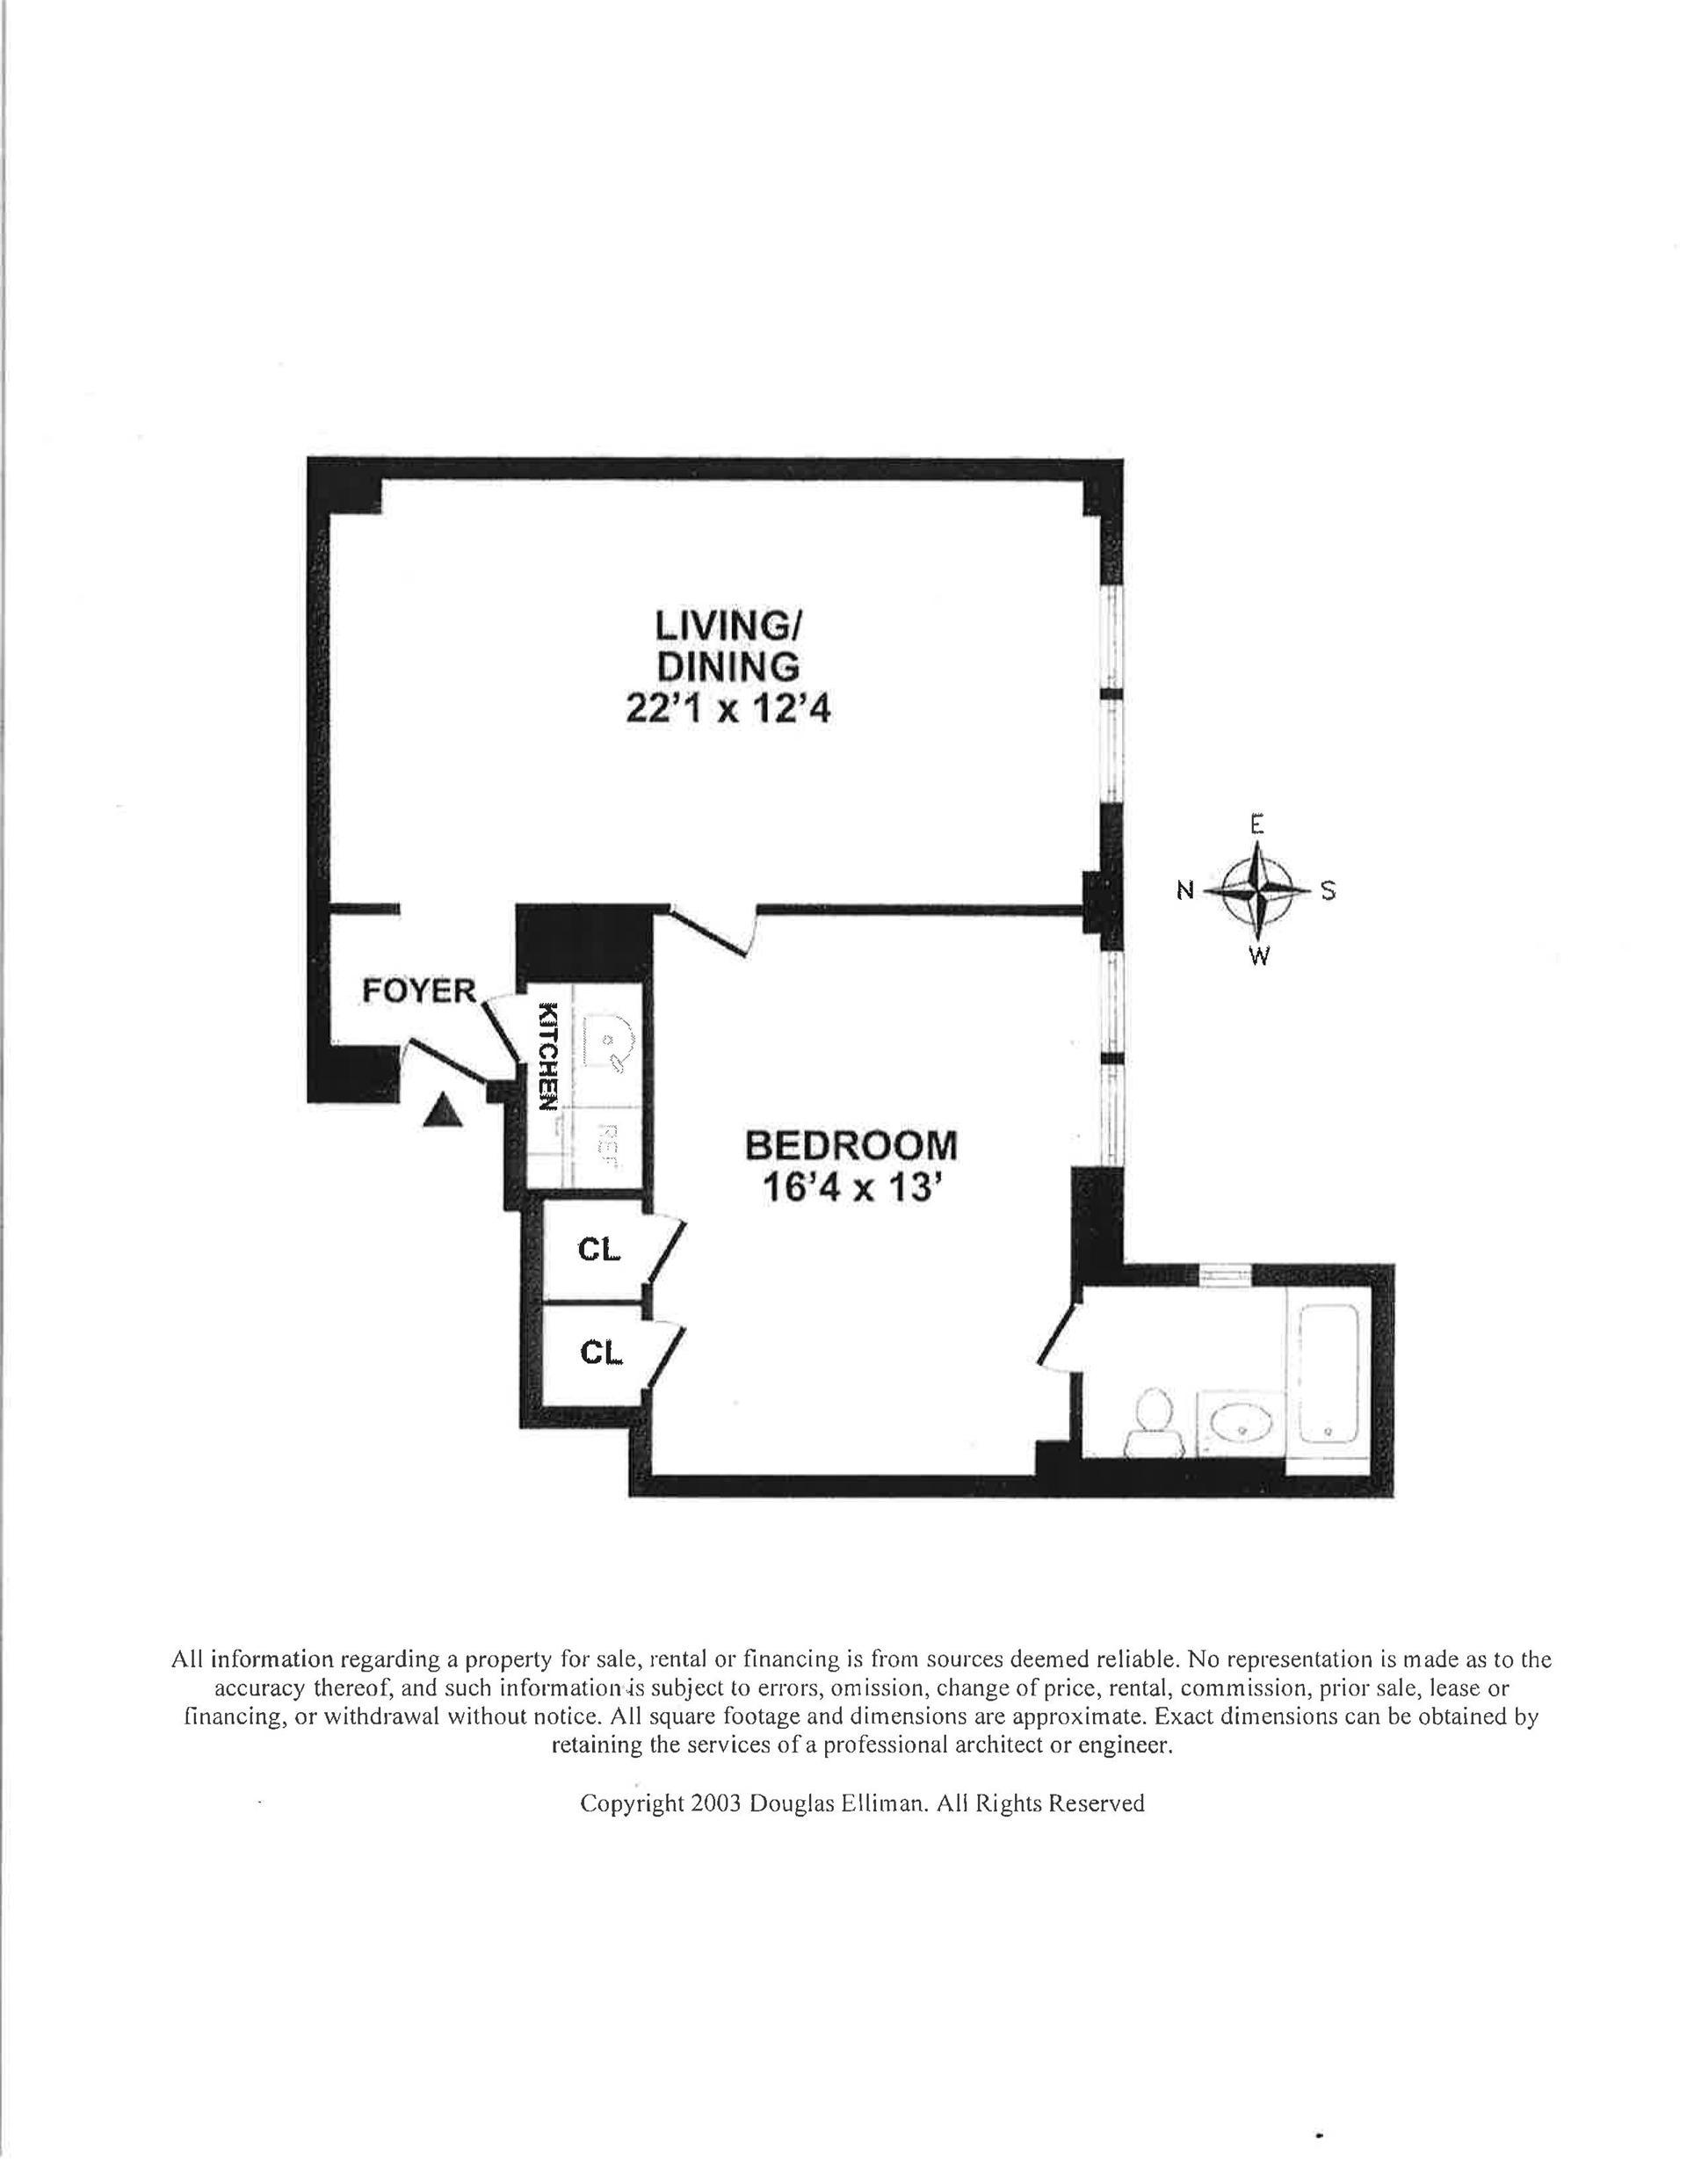 Floor plan of THE BEEKMAN, 575 Park Avenue, 1205 - Upper East Side, New York